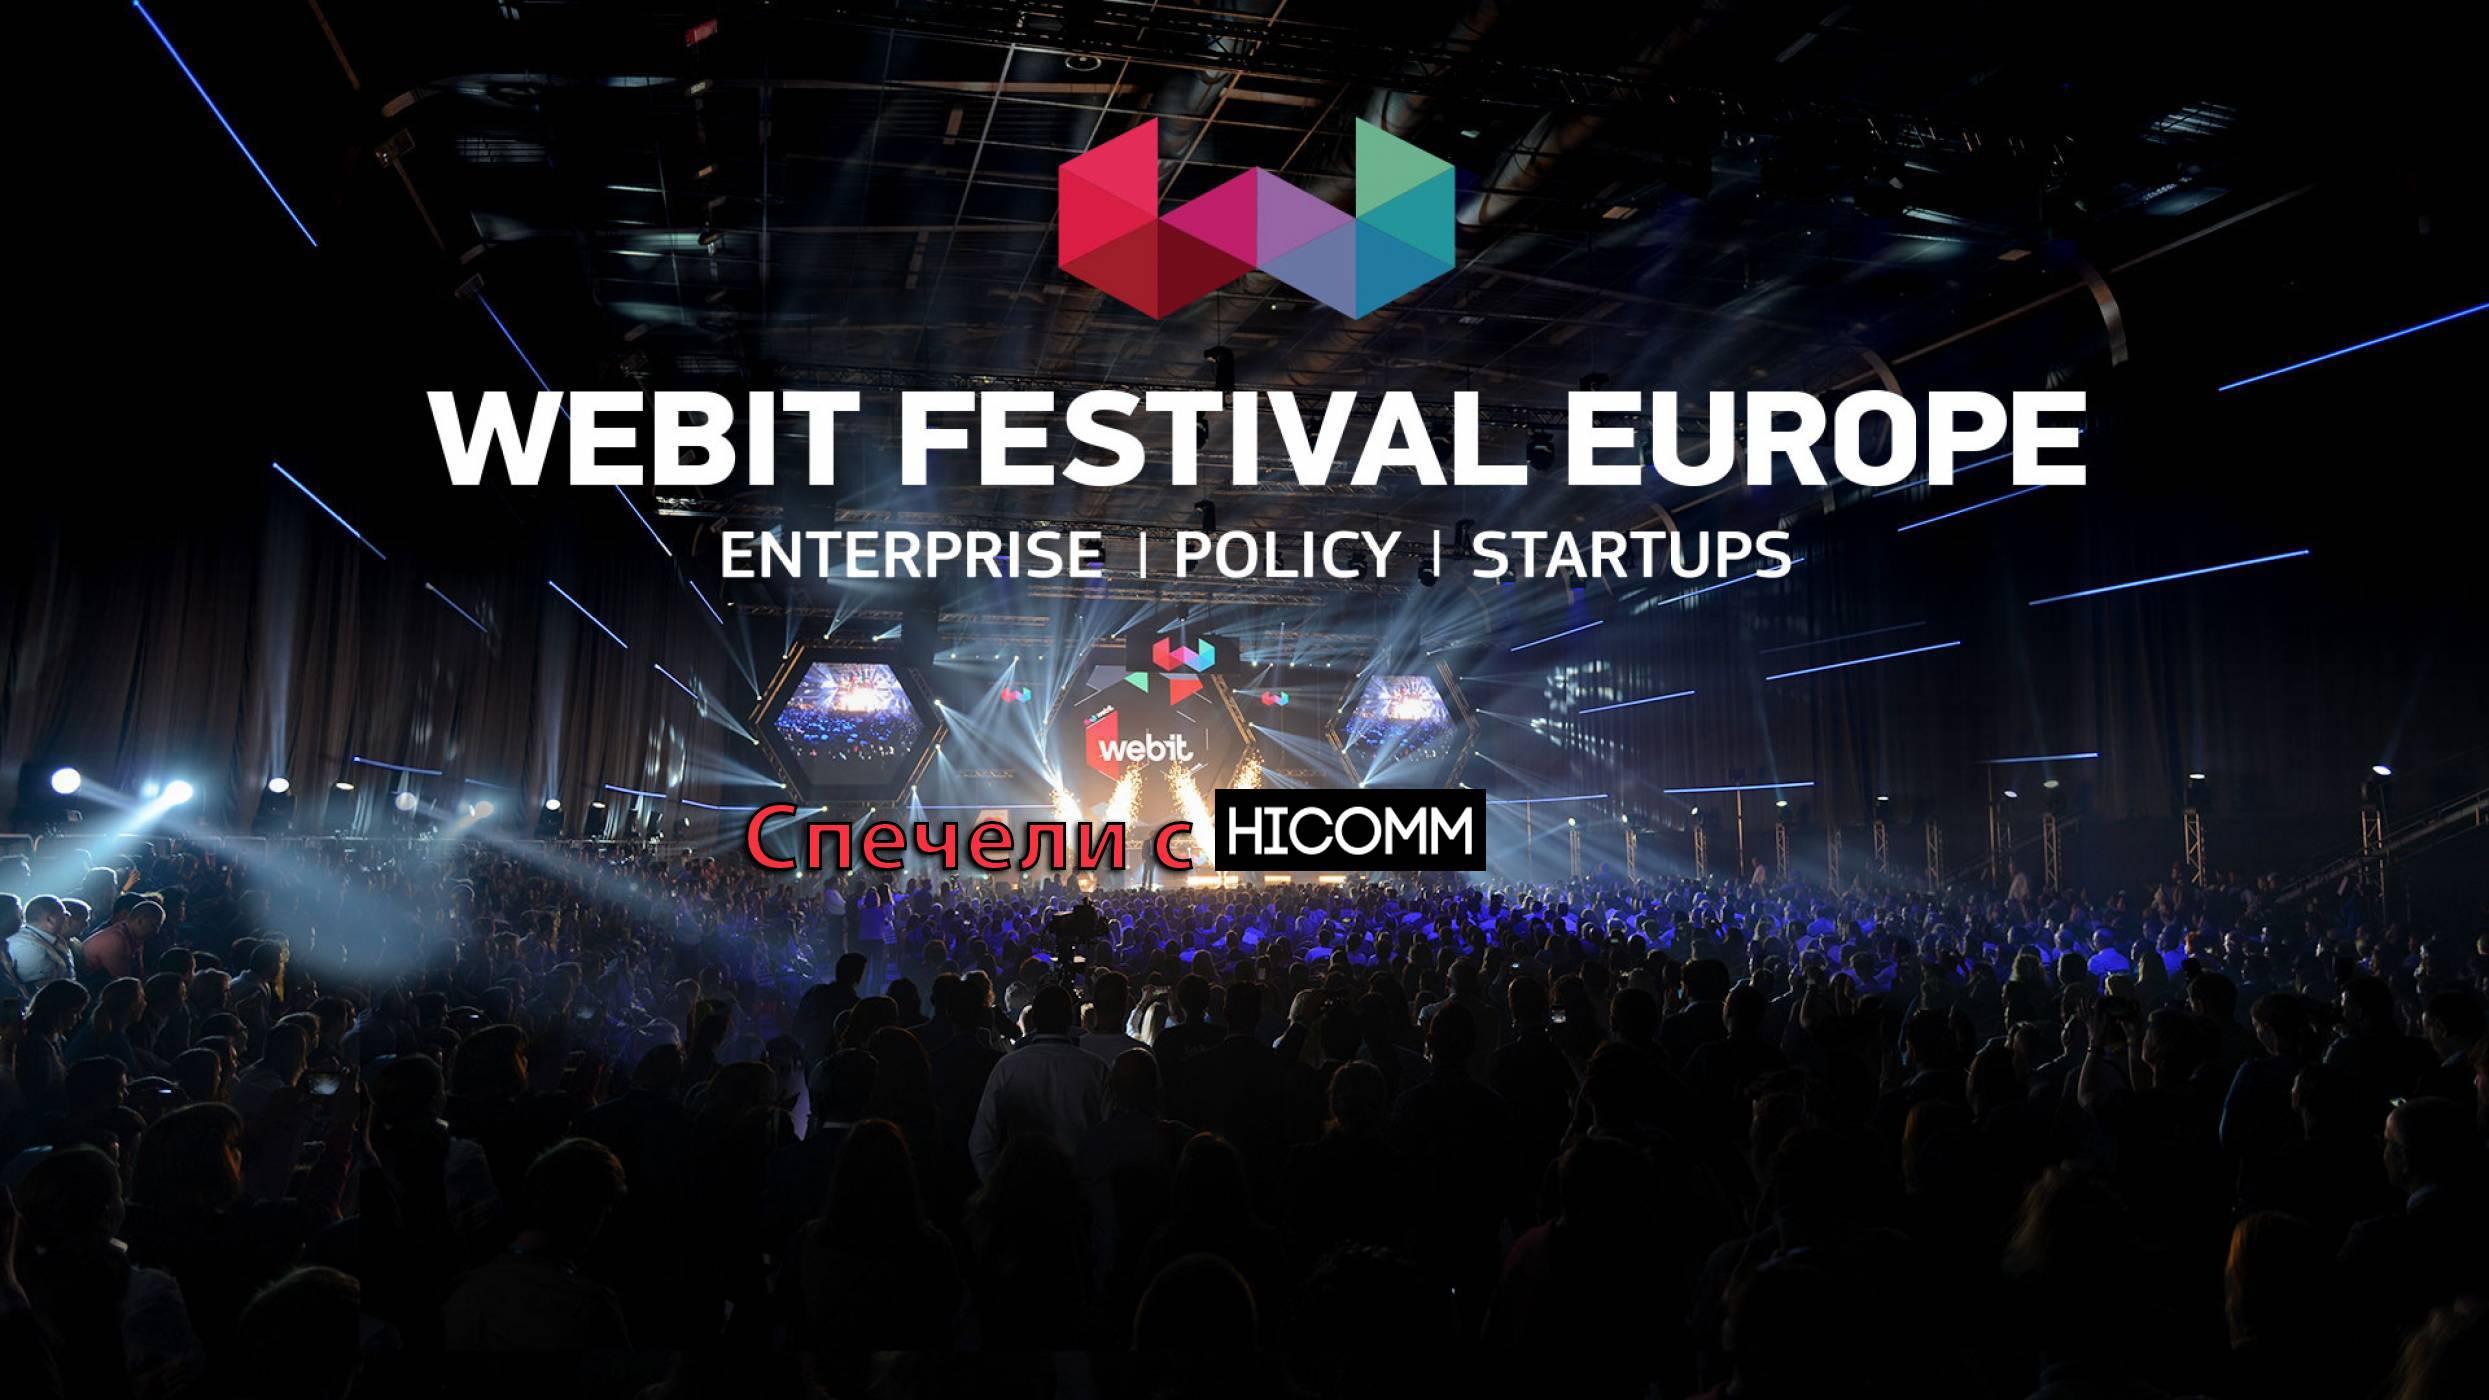 Спечели билет за Webit с HiComm!